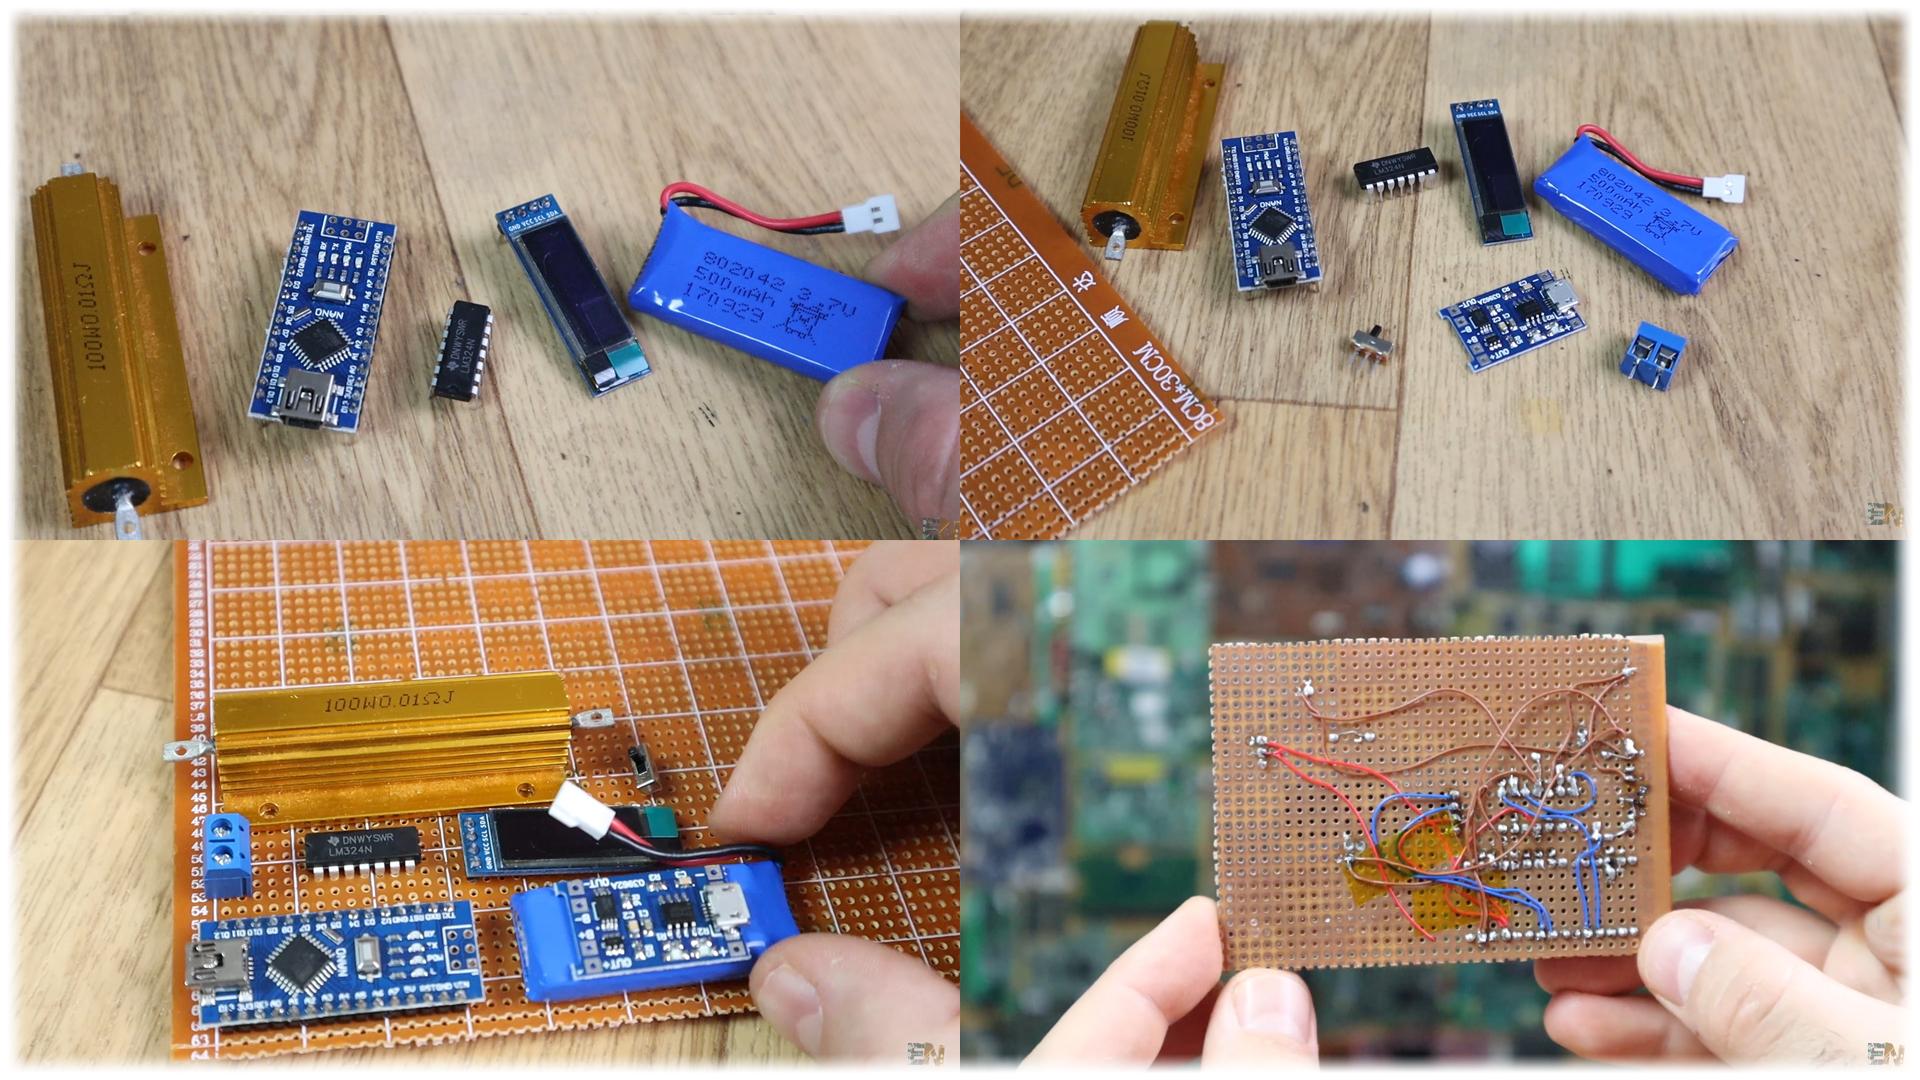 DIY Arduino power meter logger homemade